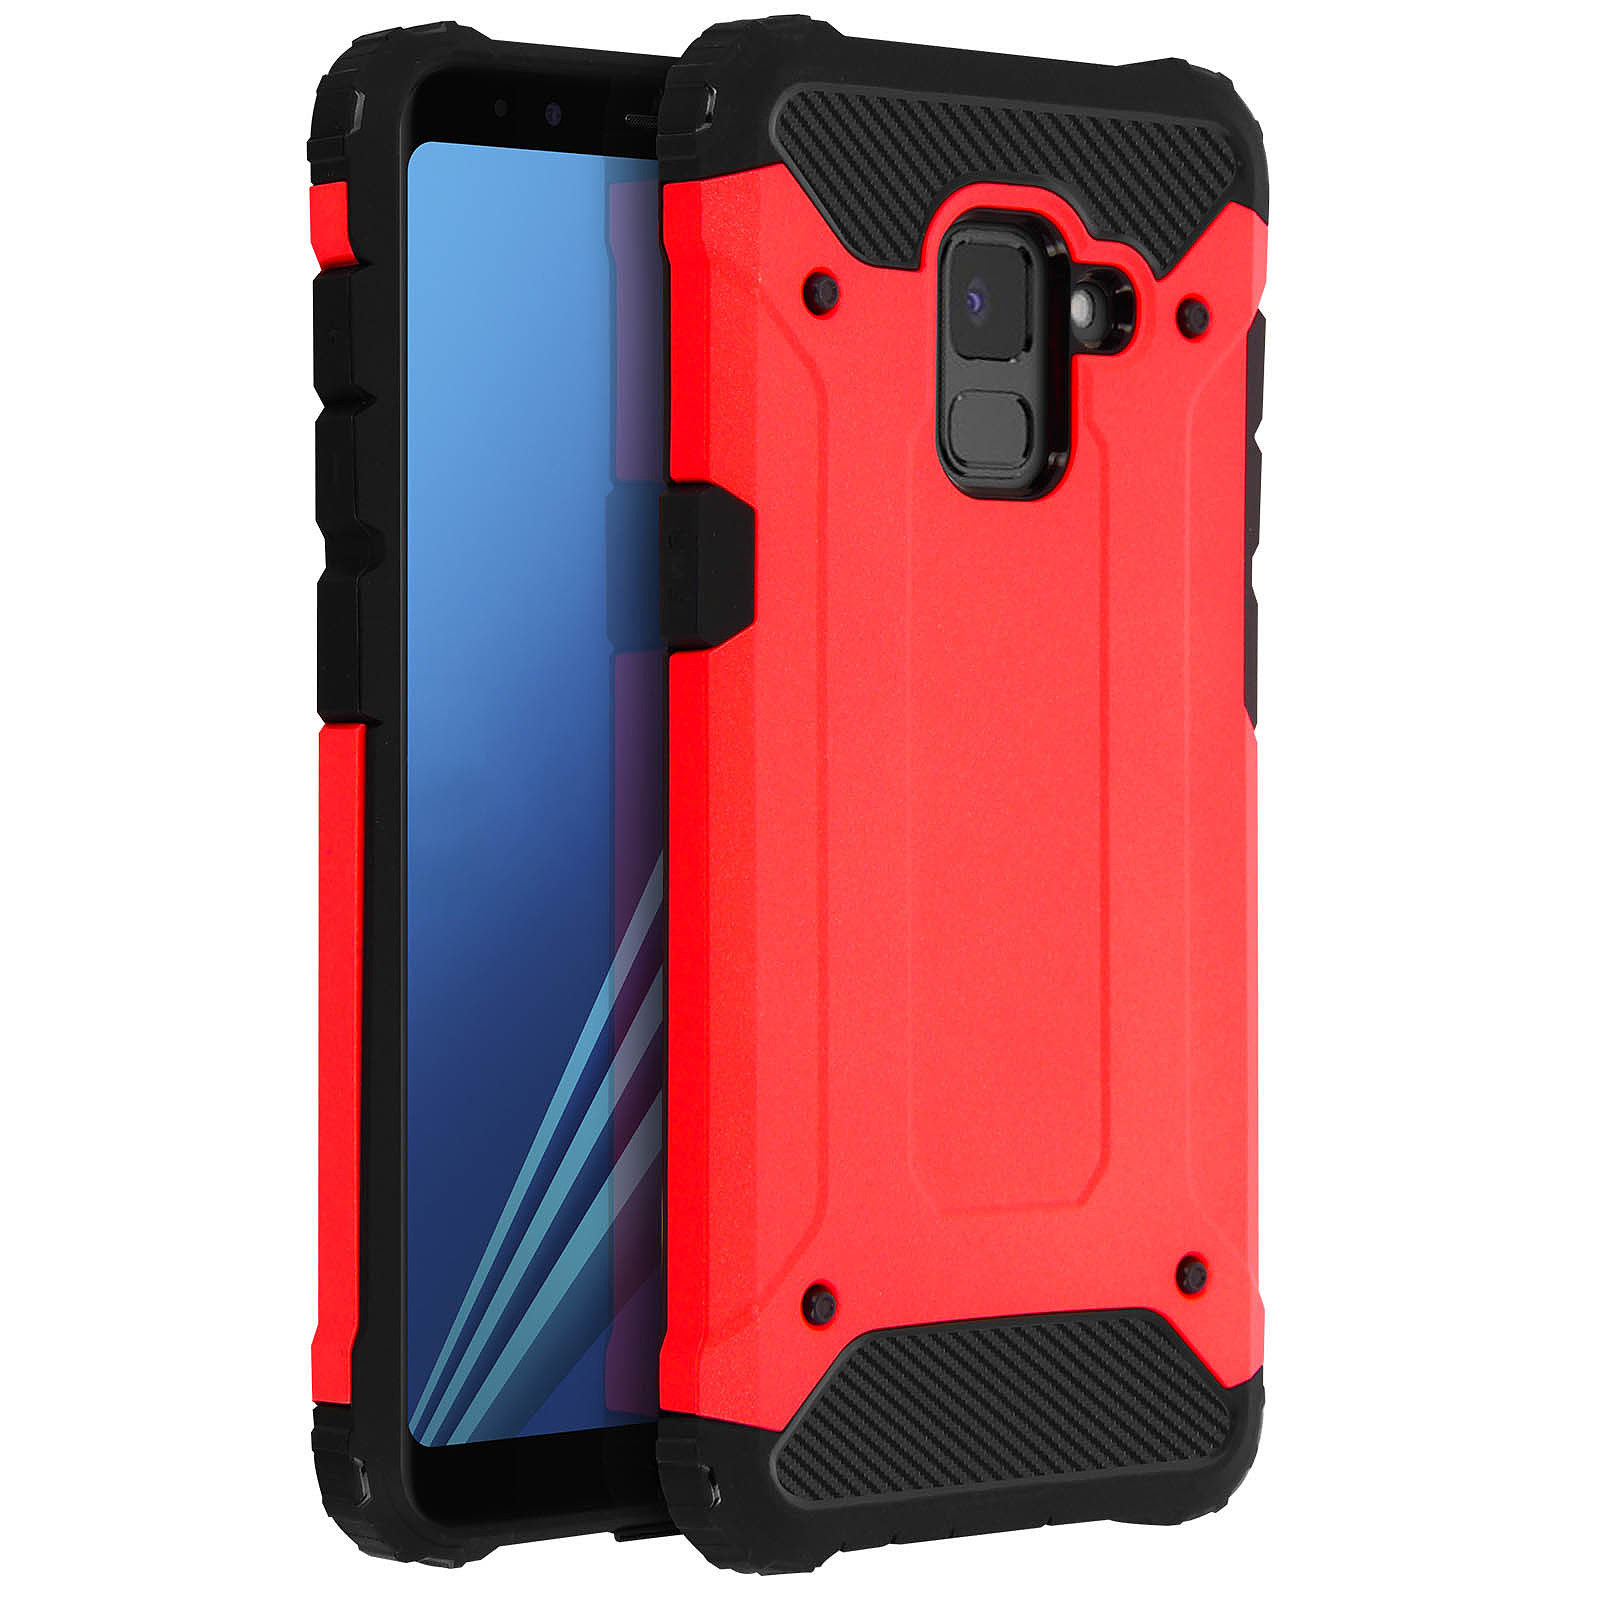 Avizar Coque Rouge pour Samsung Galaxy A8 - Coque téléphone Avizar ...